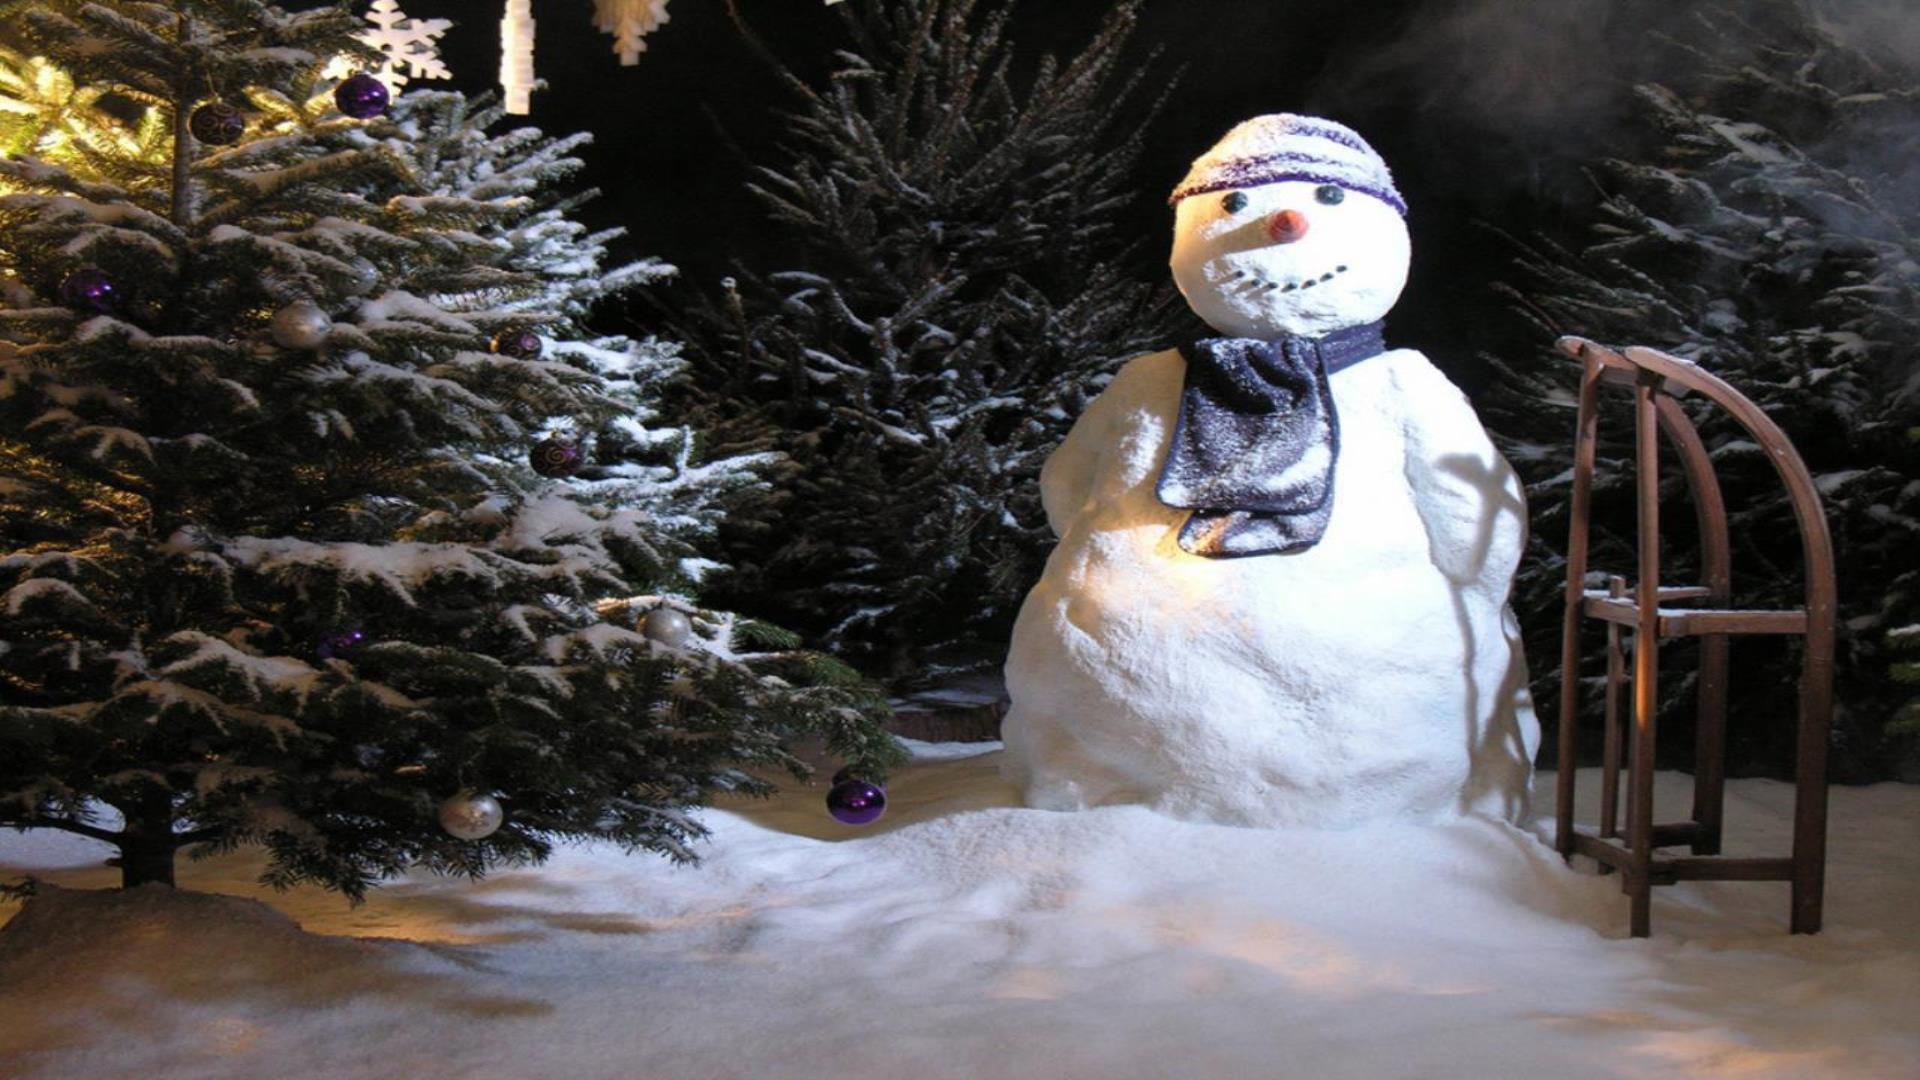 Nep Sneeuwpop